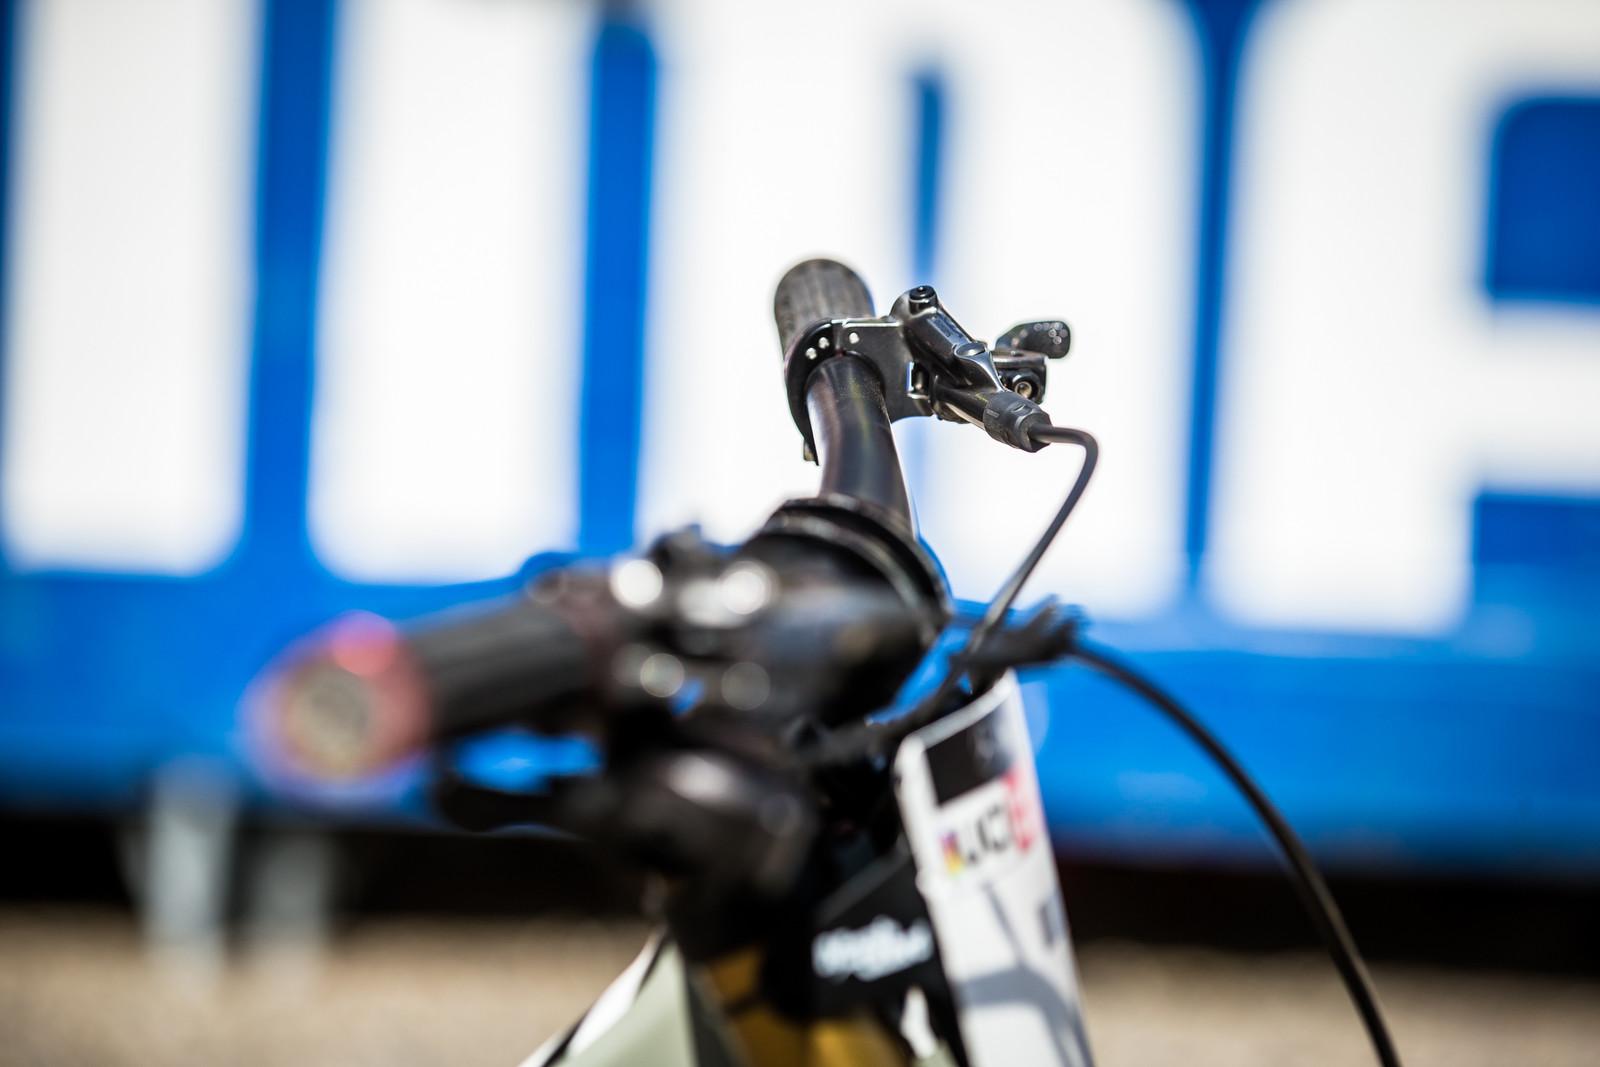 Flat levers for Loris - WINNING BIKE - Loris Vergier's Santa Cruz V10cc 29 - Mountain Biking Pictures - Vital MTB